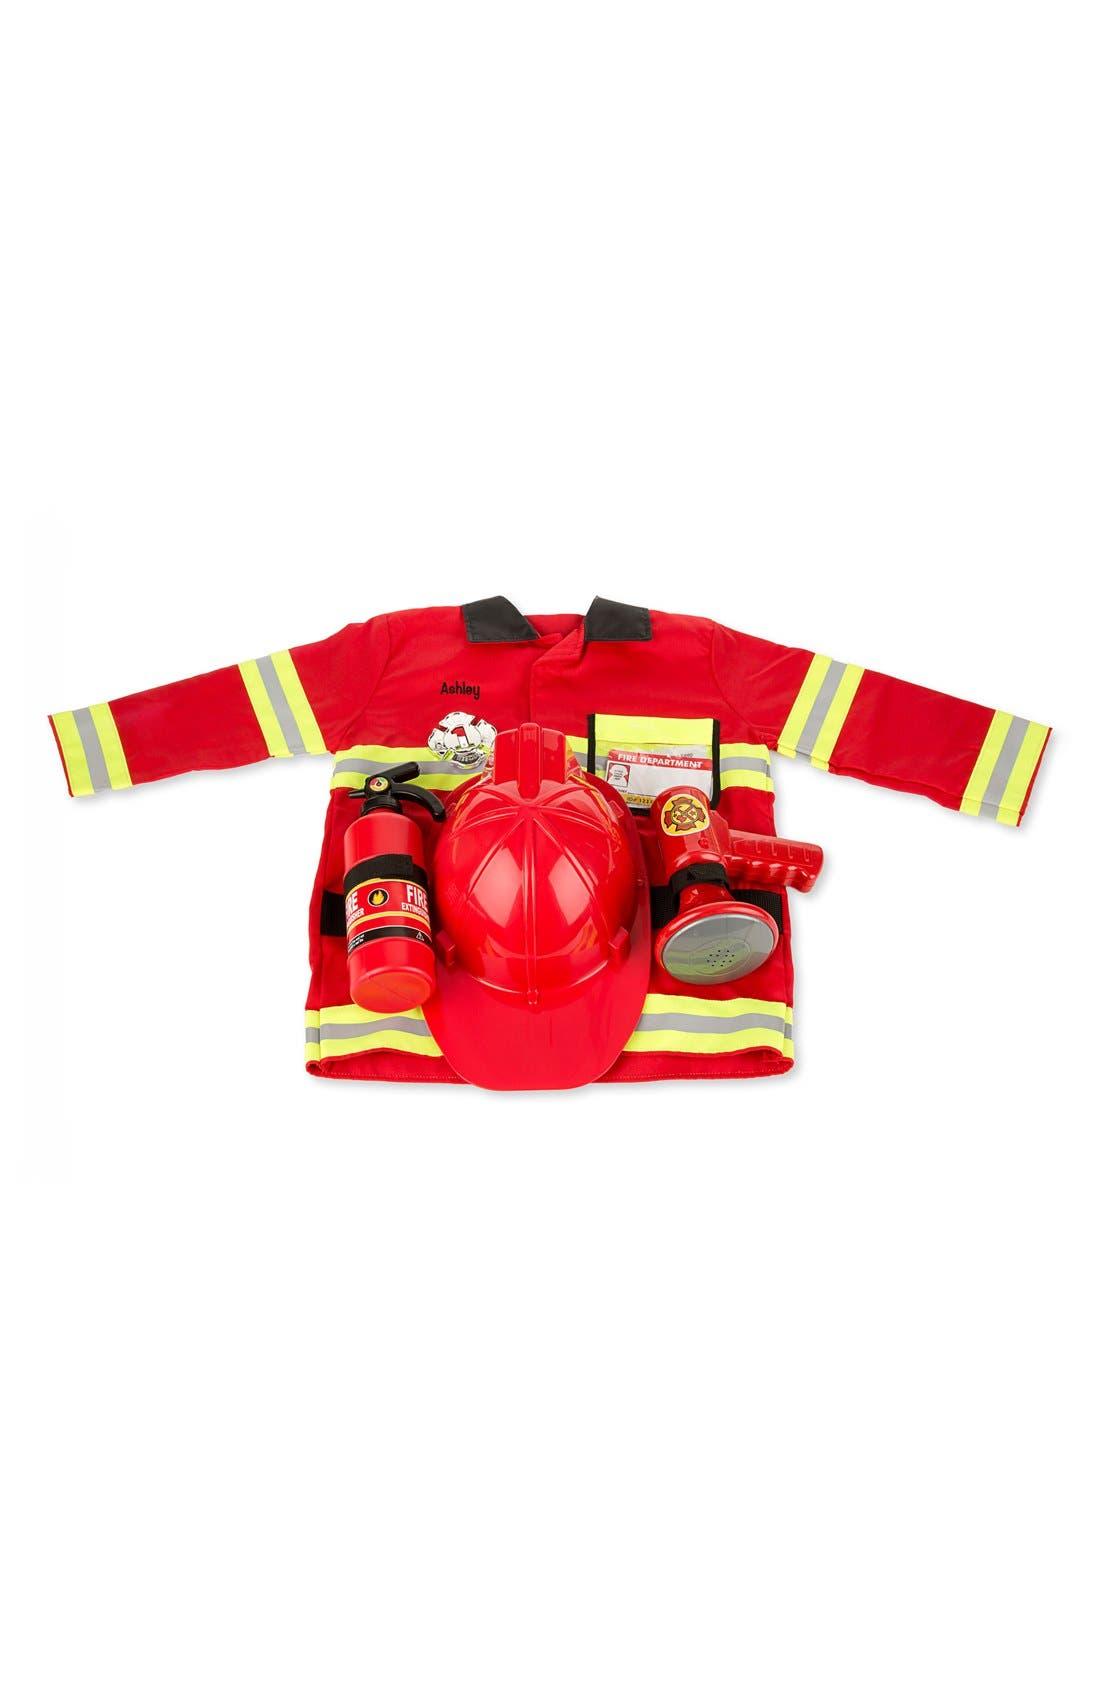 Main Image - Melissa & Doug Personalized Fire Chief Costume Set (Little Kid)